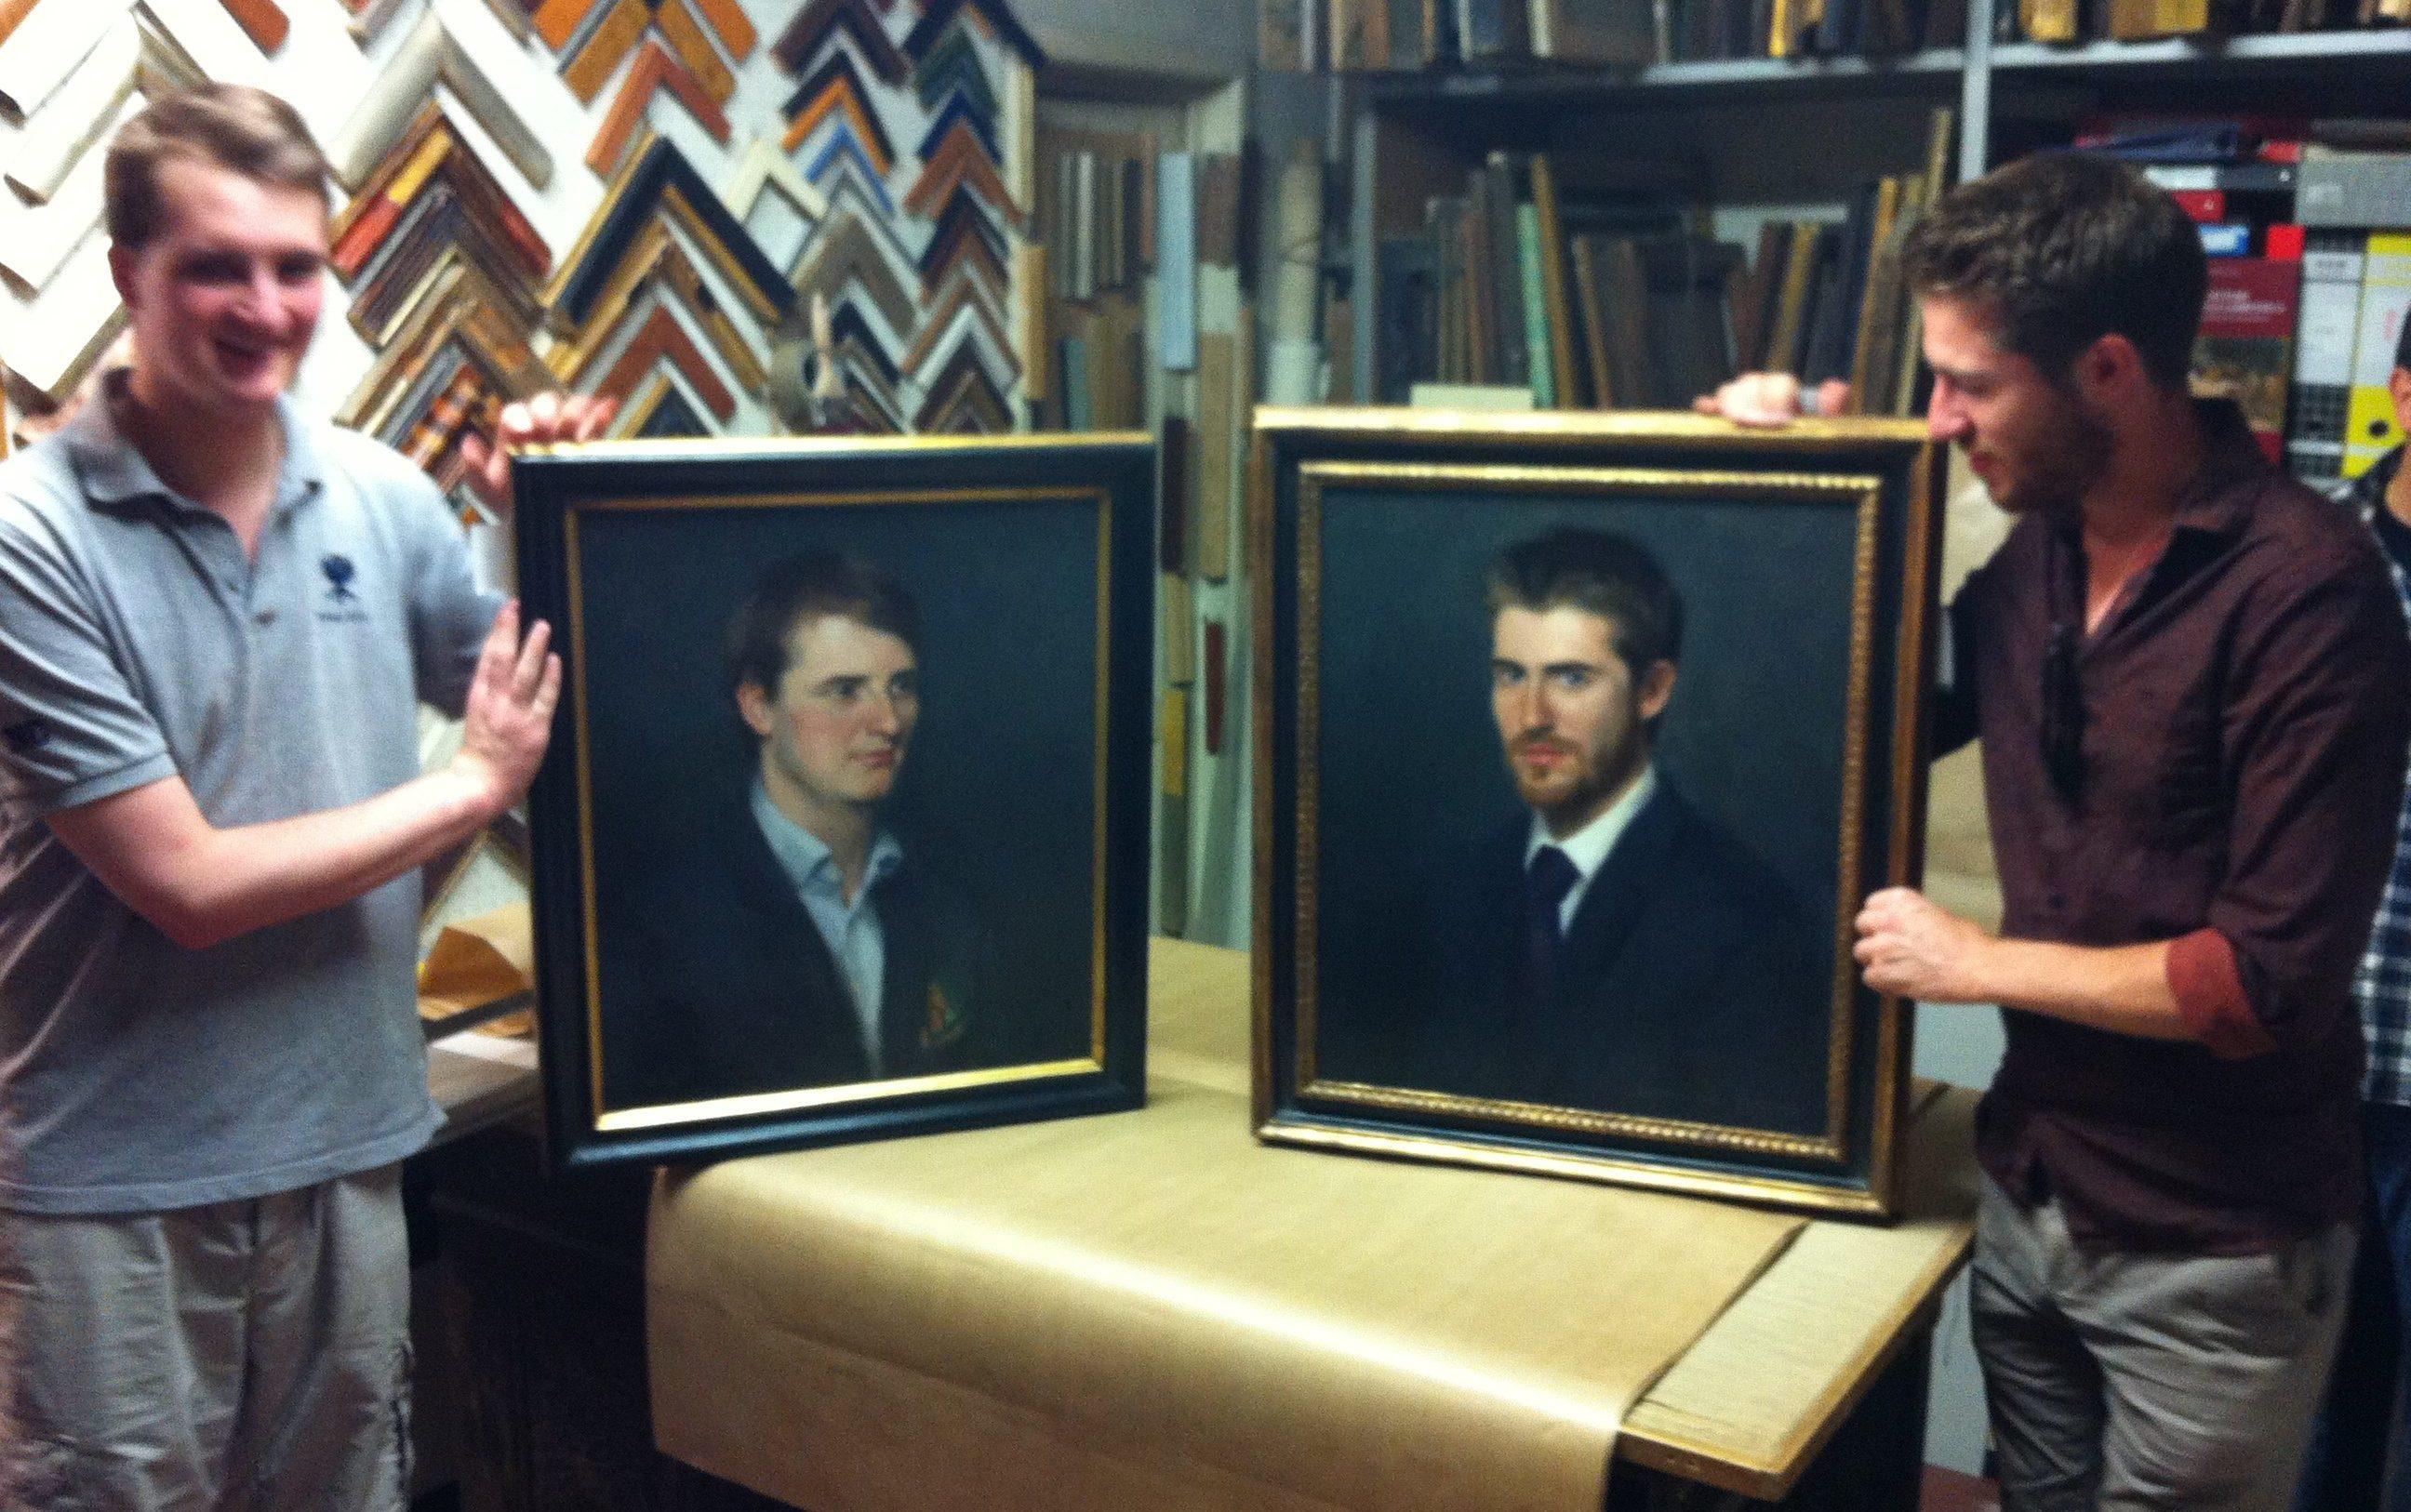 Framing of portraits, Thomas Henderson and Nick Chapmen